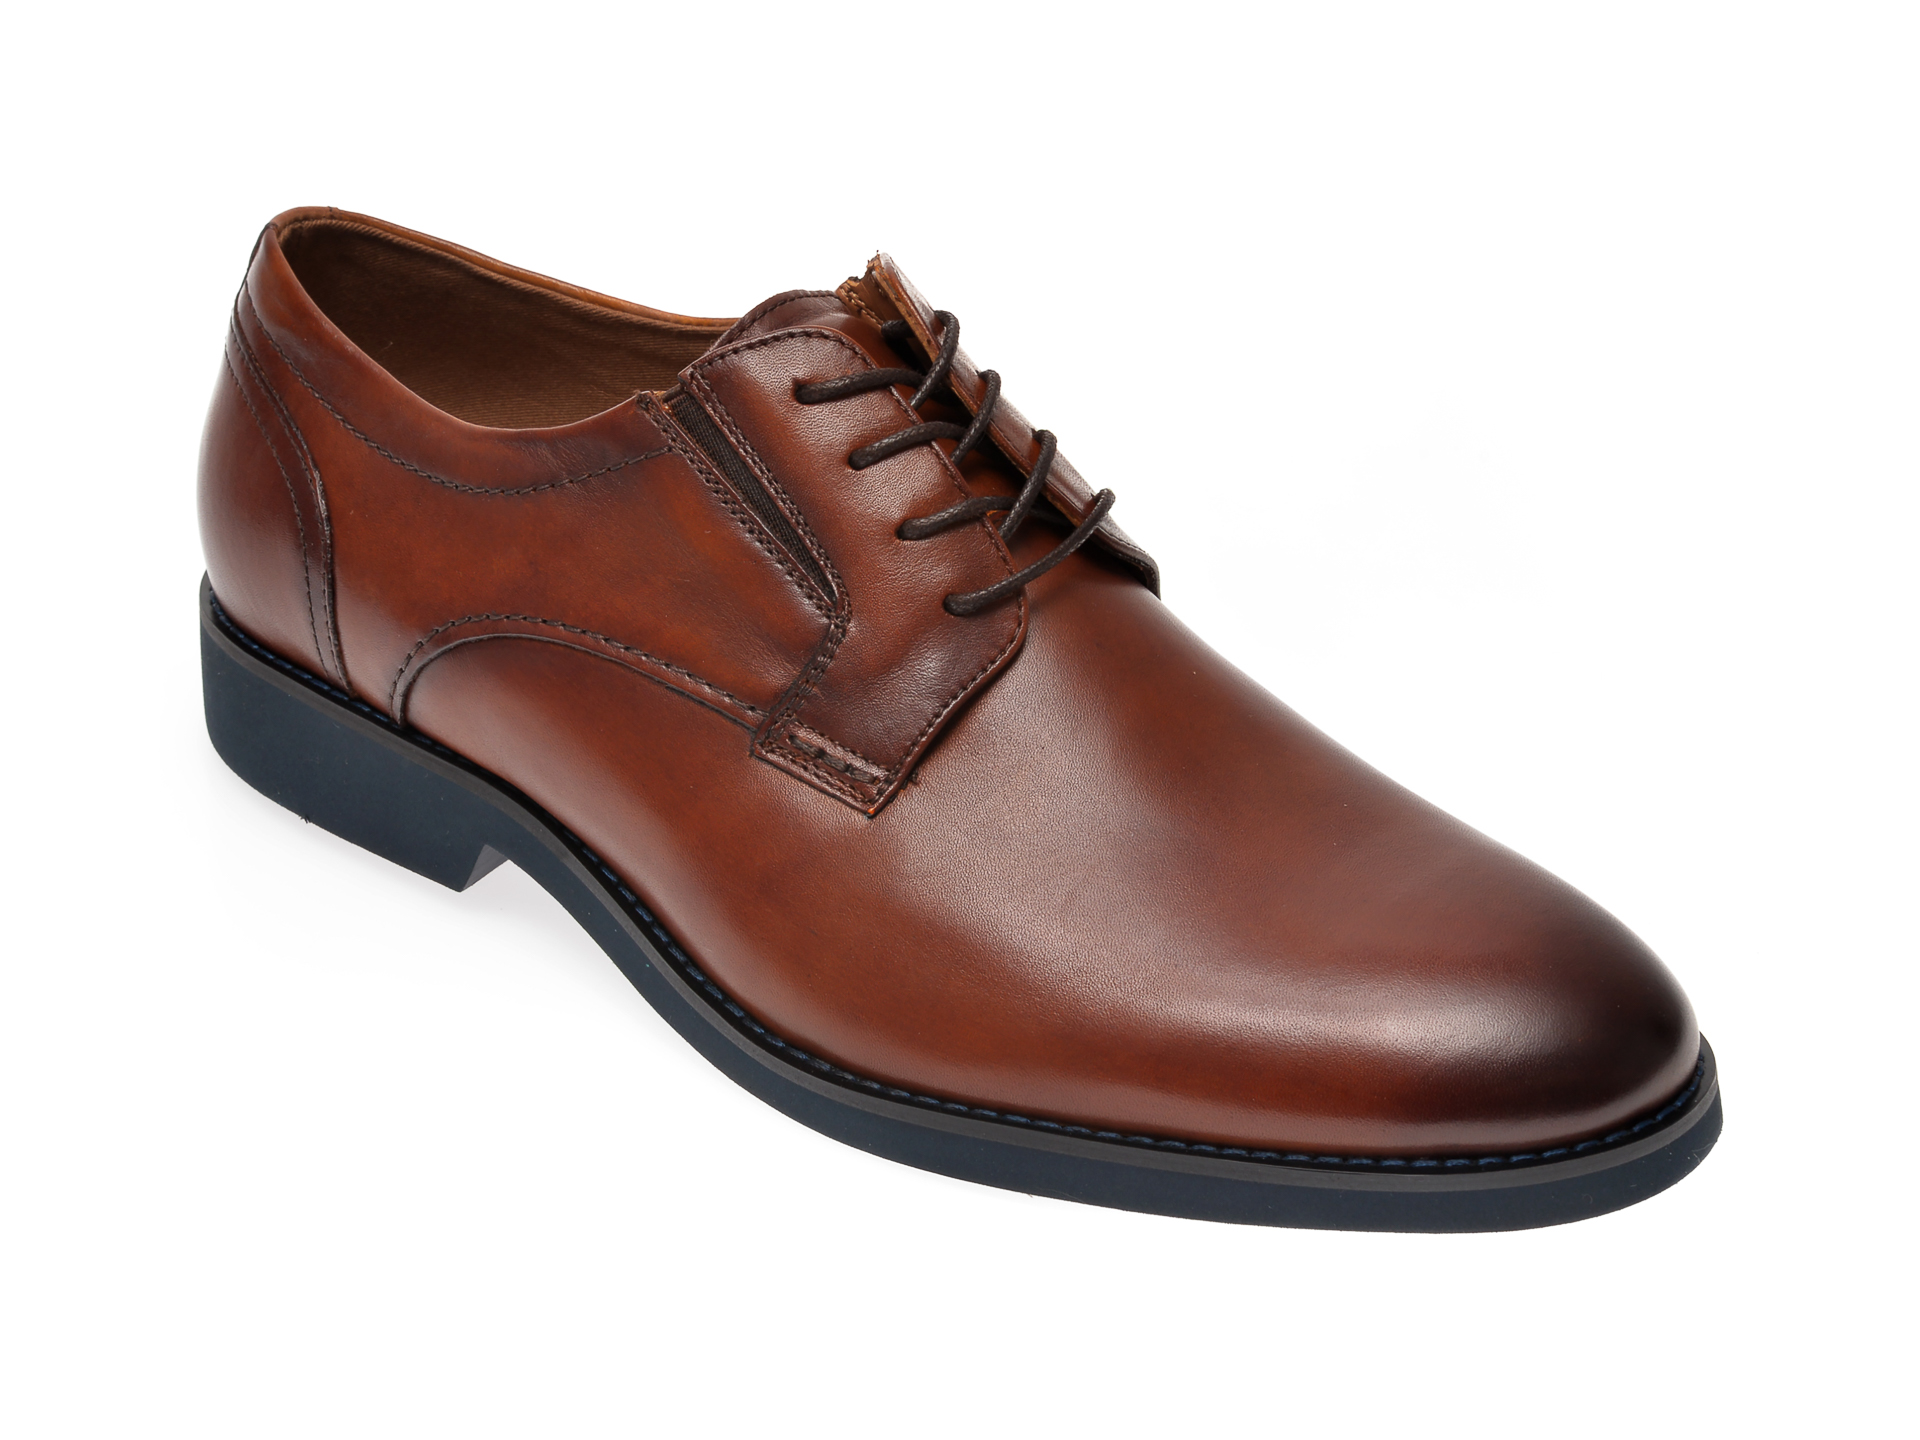 Pantofi ALDO maro, Rorelind220, din piele naturala imagine